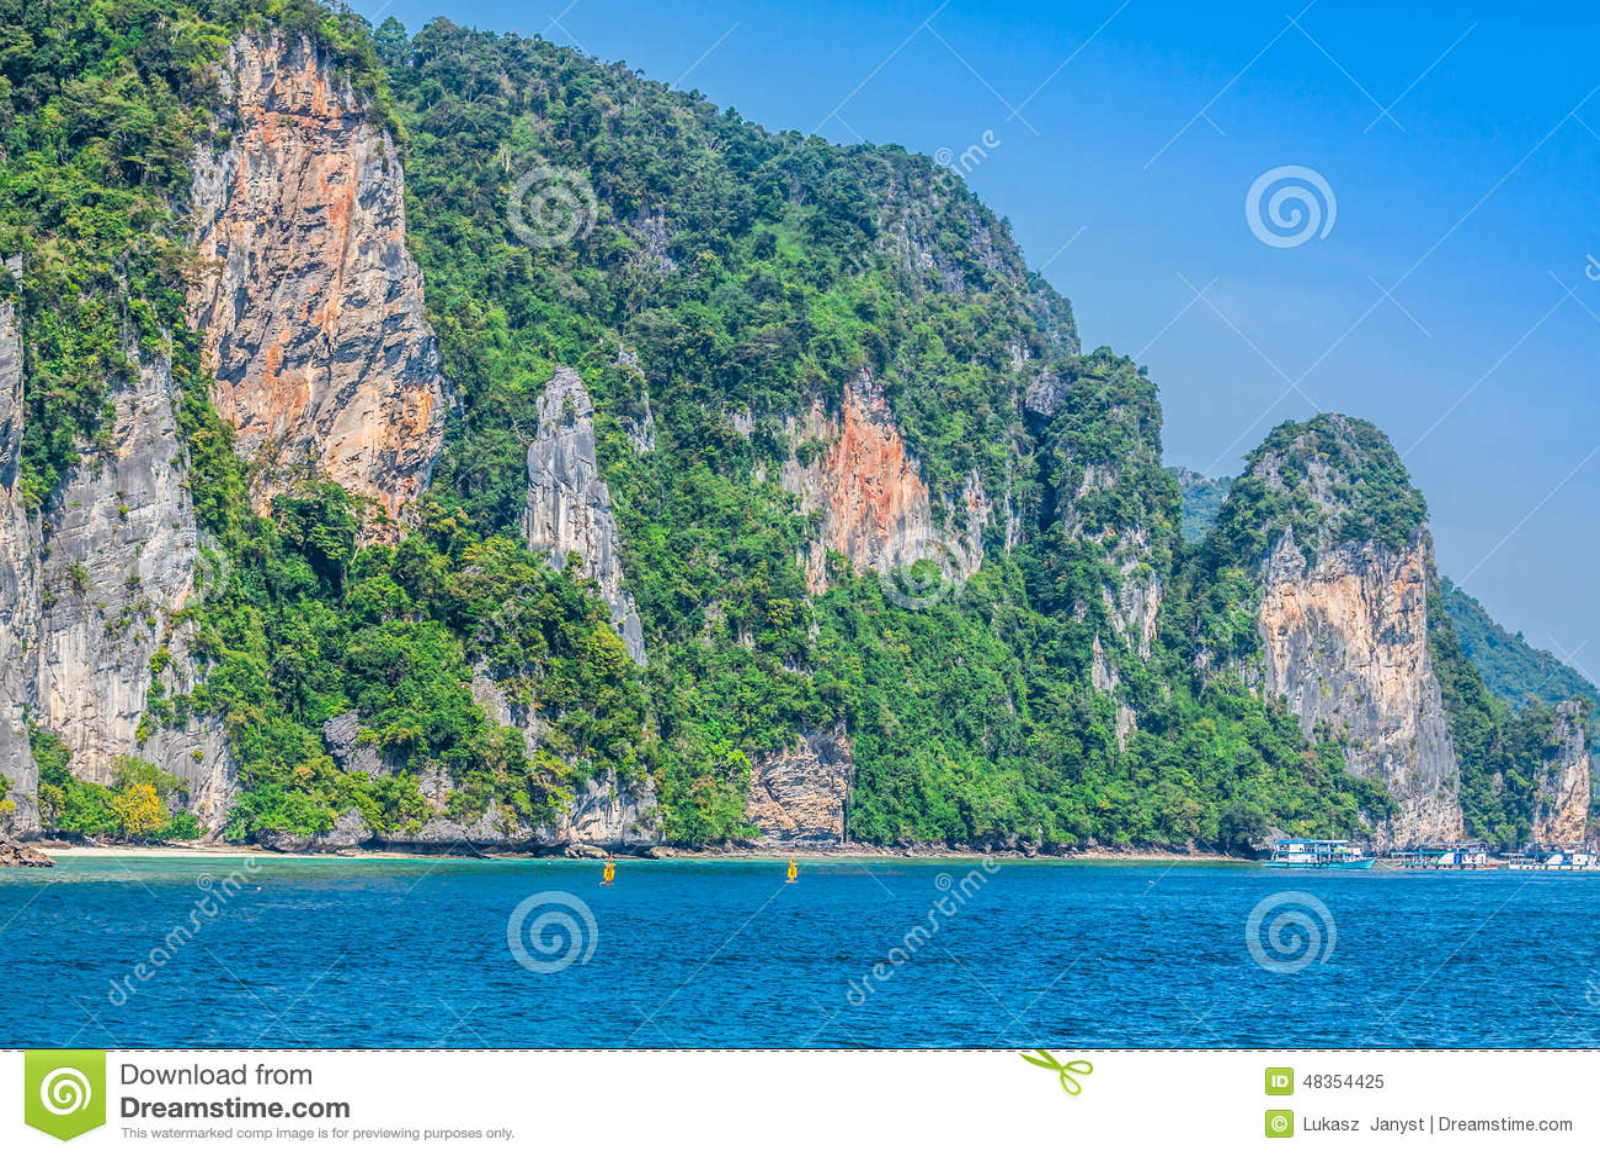 beautiful tropical islands at - photo #27